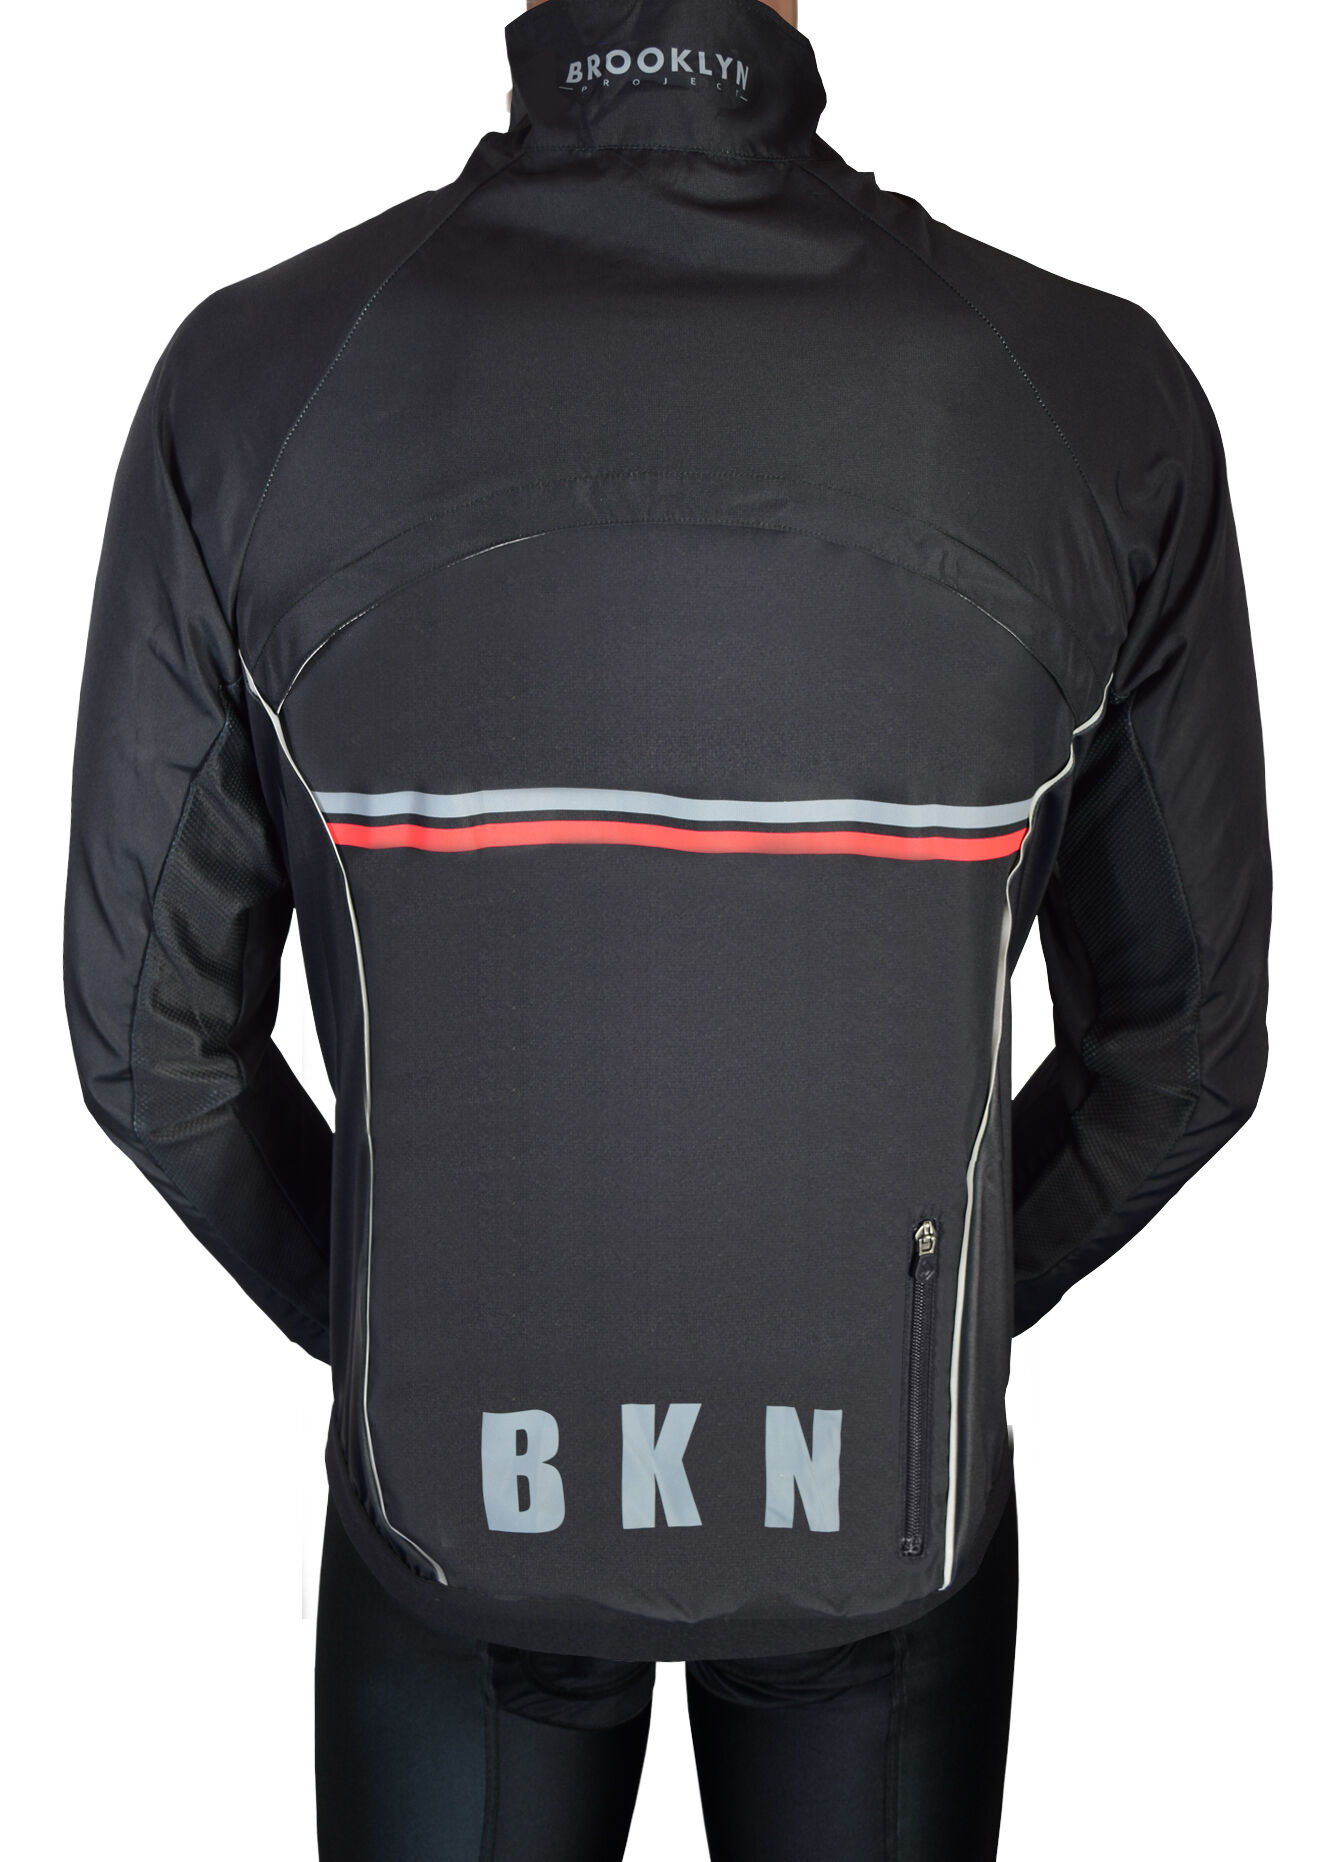 Brookly Jacket Back